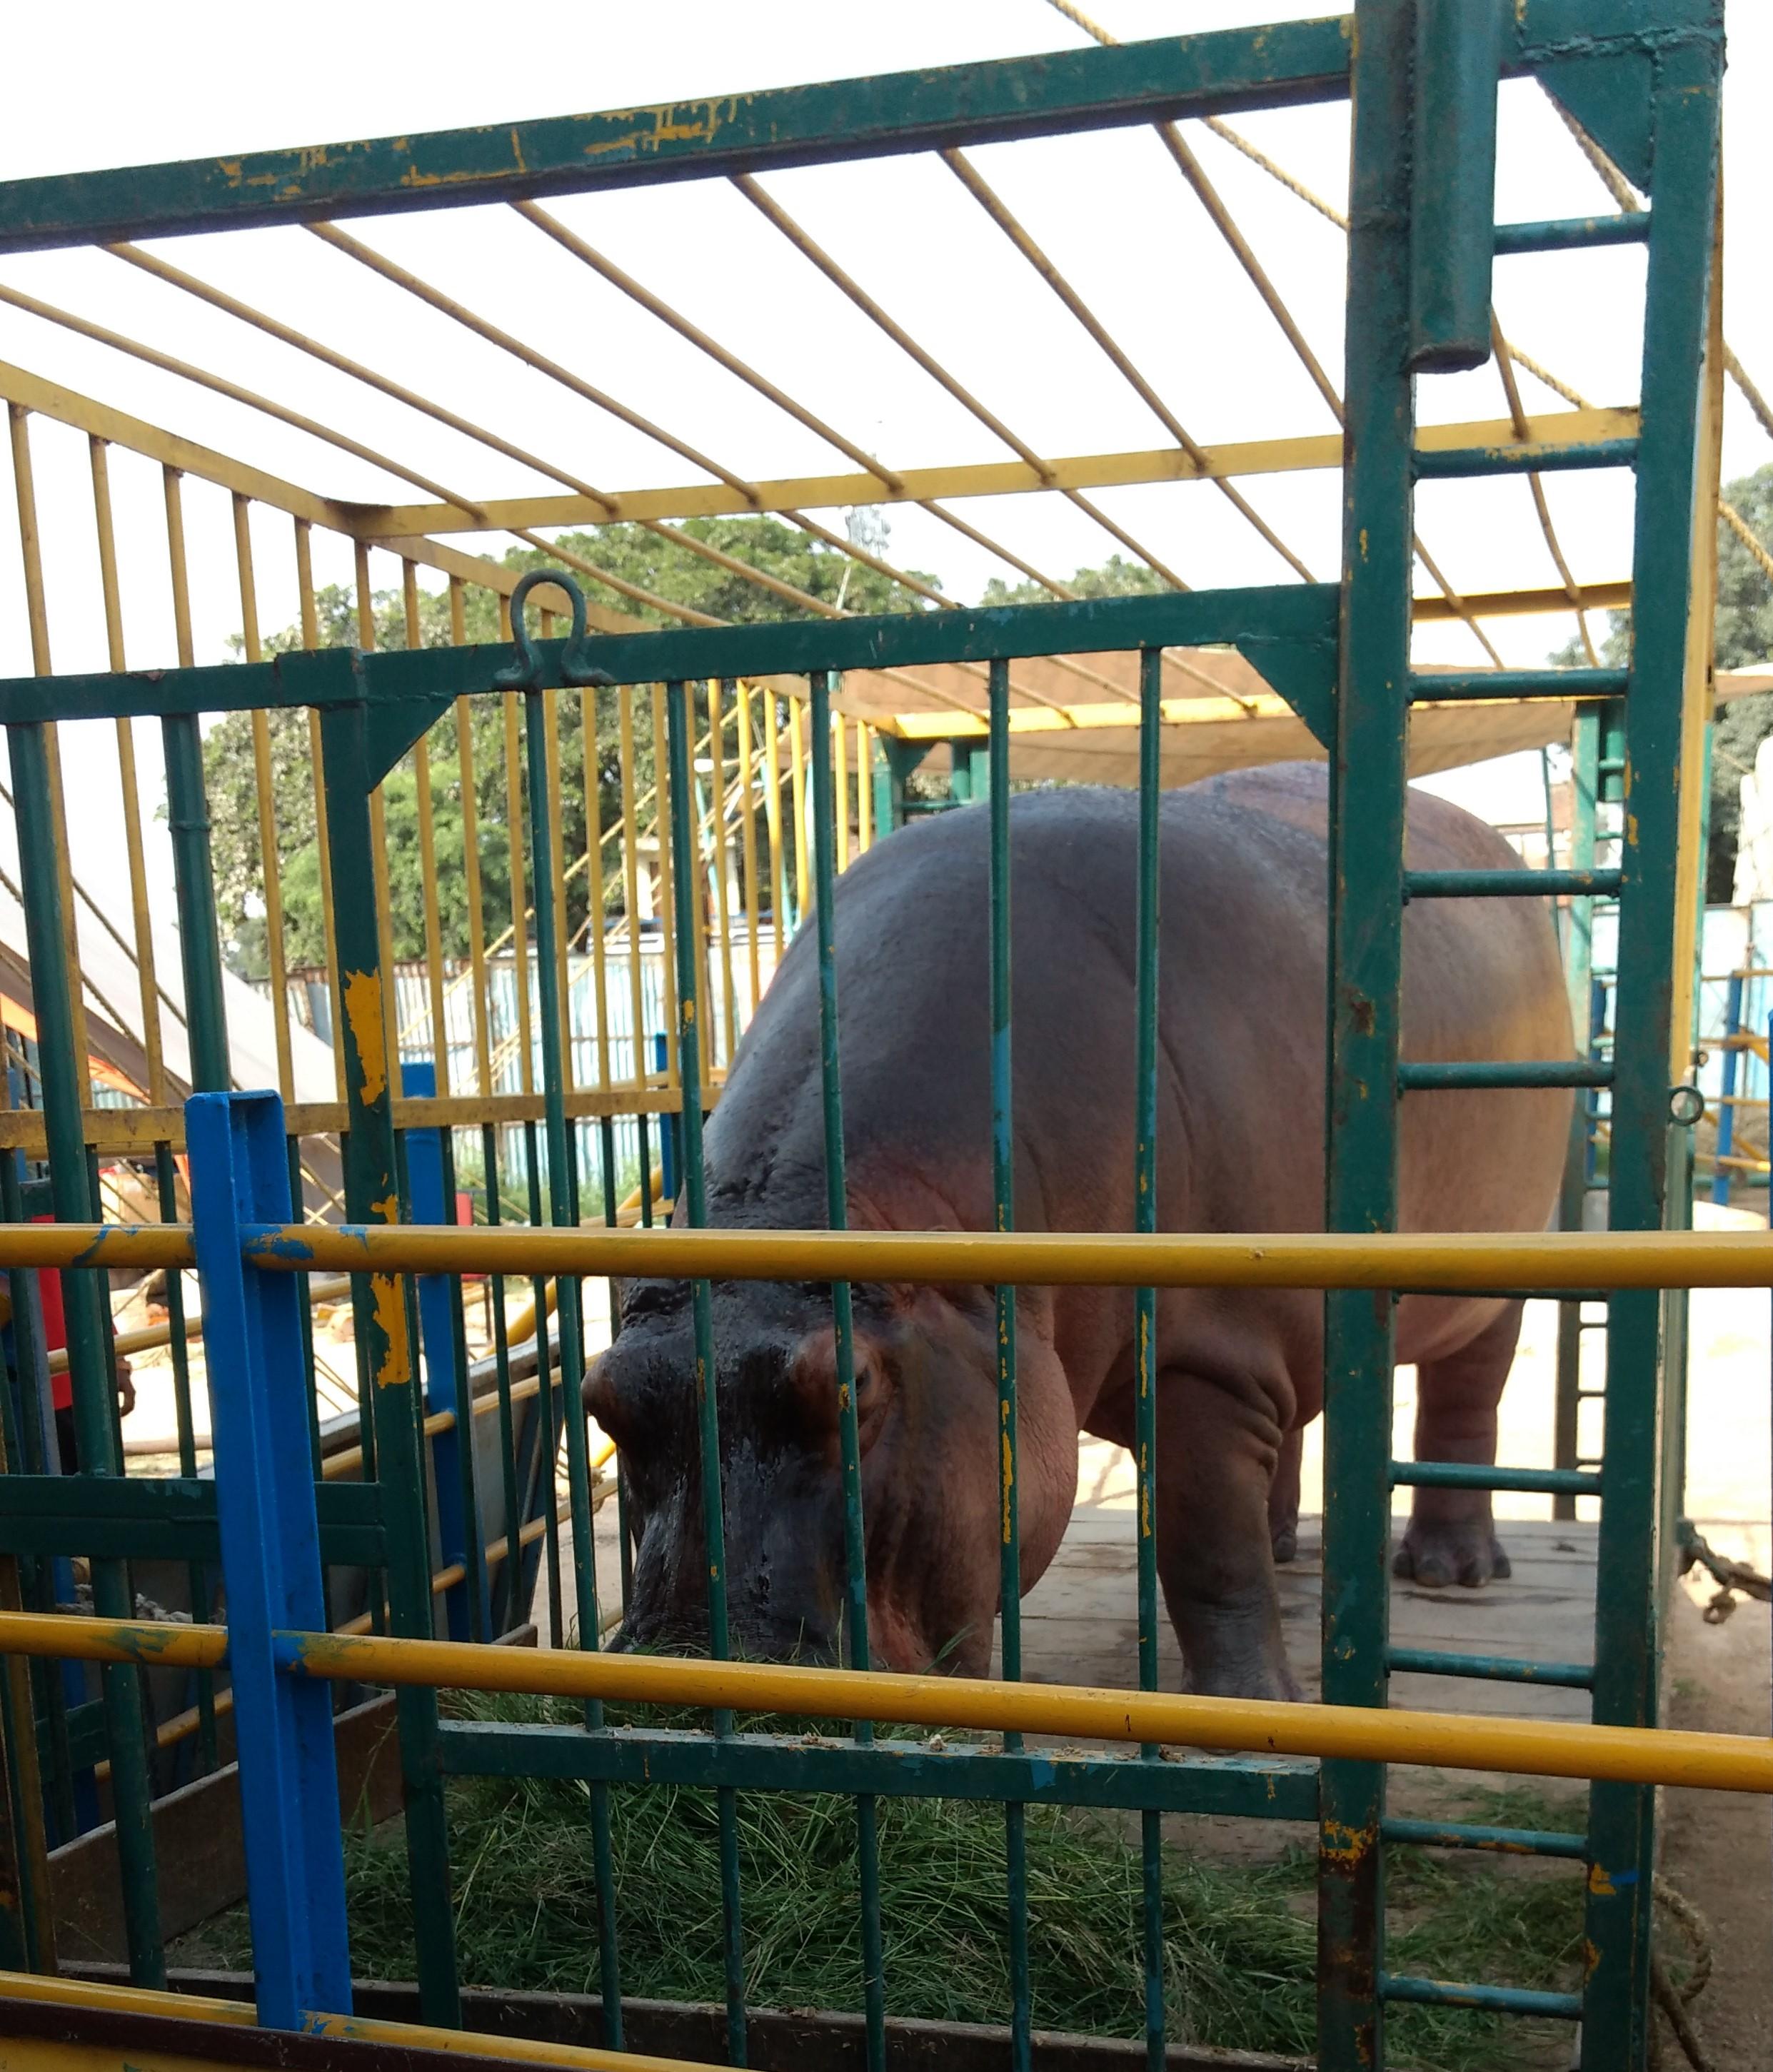 hippo at asiad circus photo